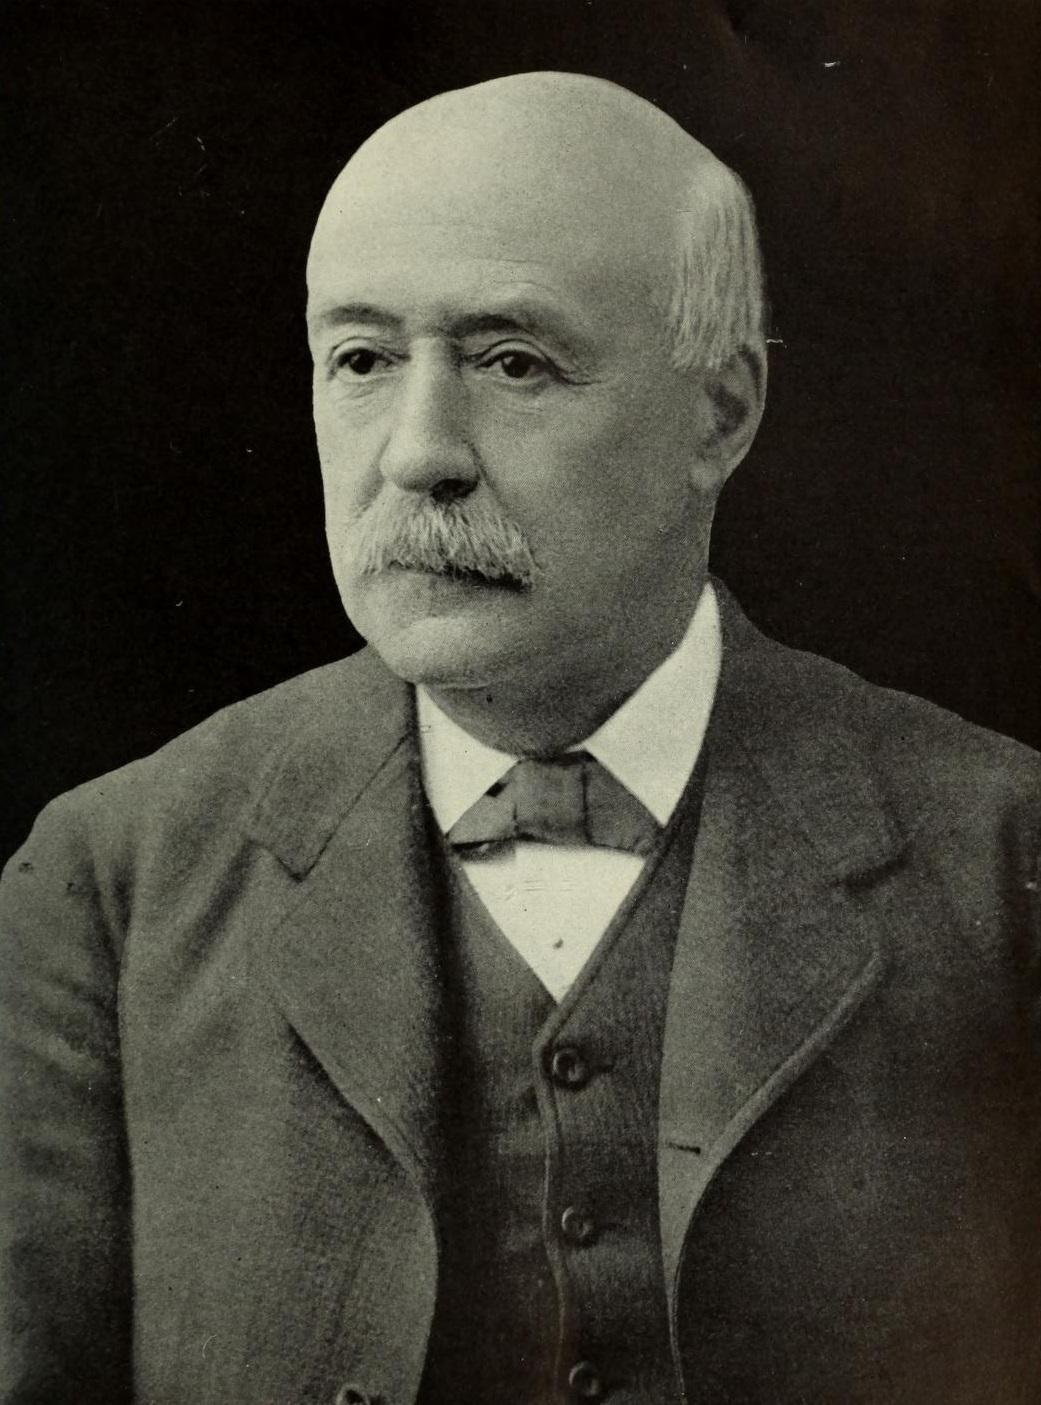 Alexander Agassiz